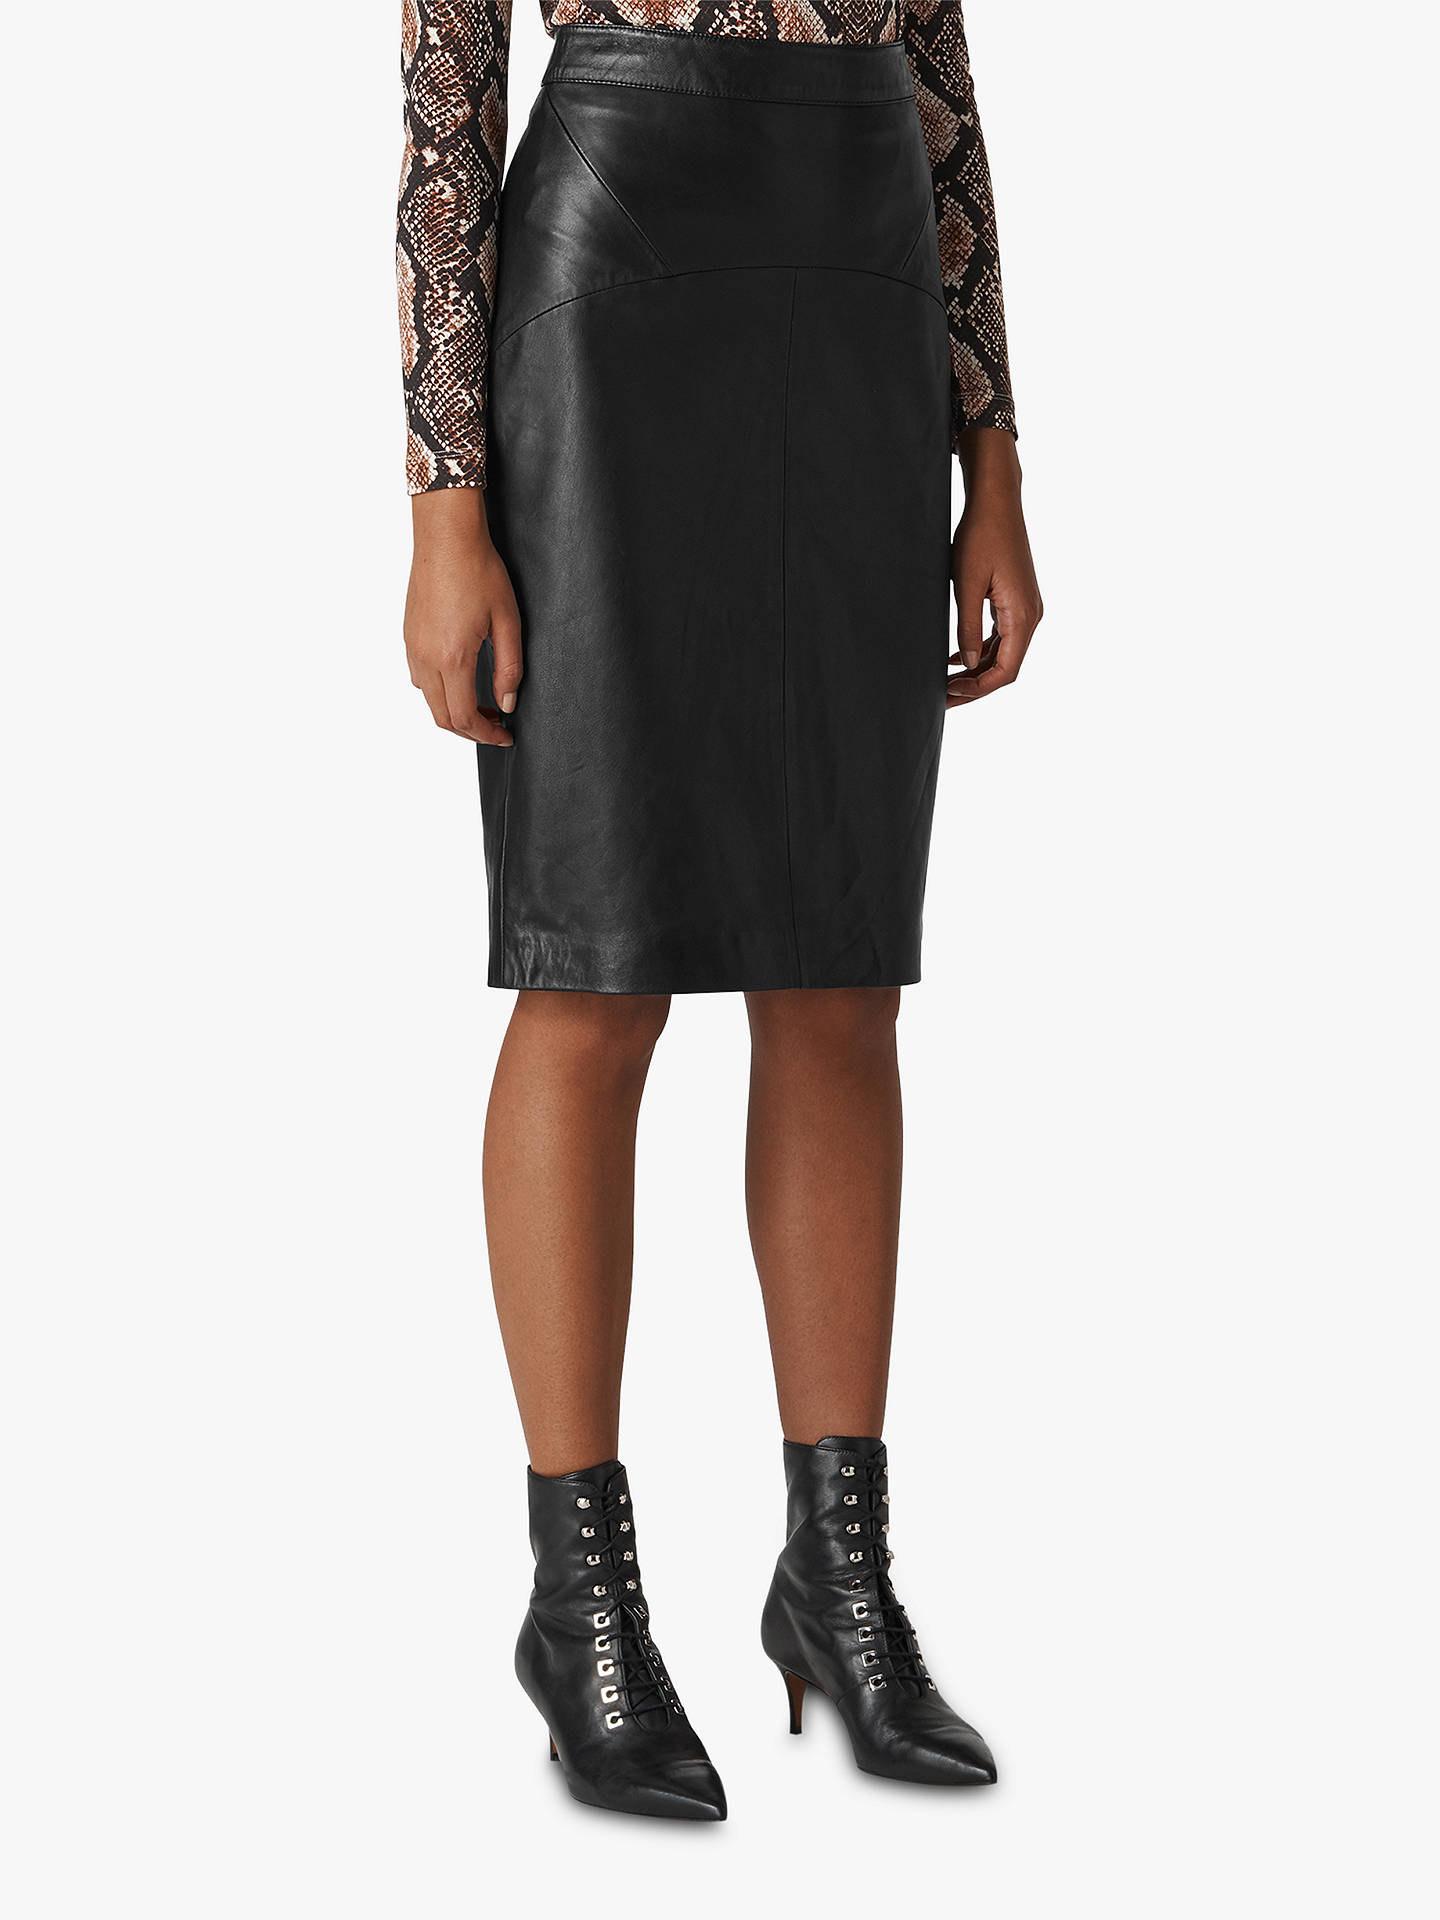 d9741325ff Buy Whistles Kel Leather Pencil Skirt, Black, 6 Online at johnlewis.com ...